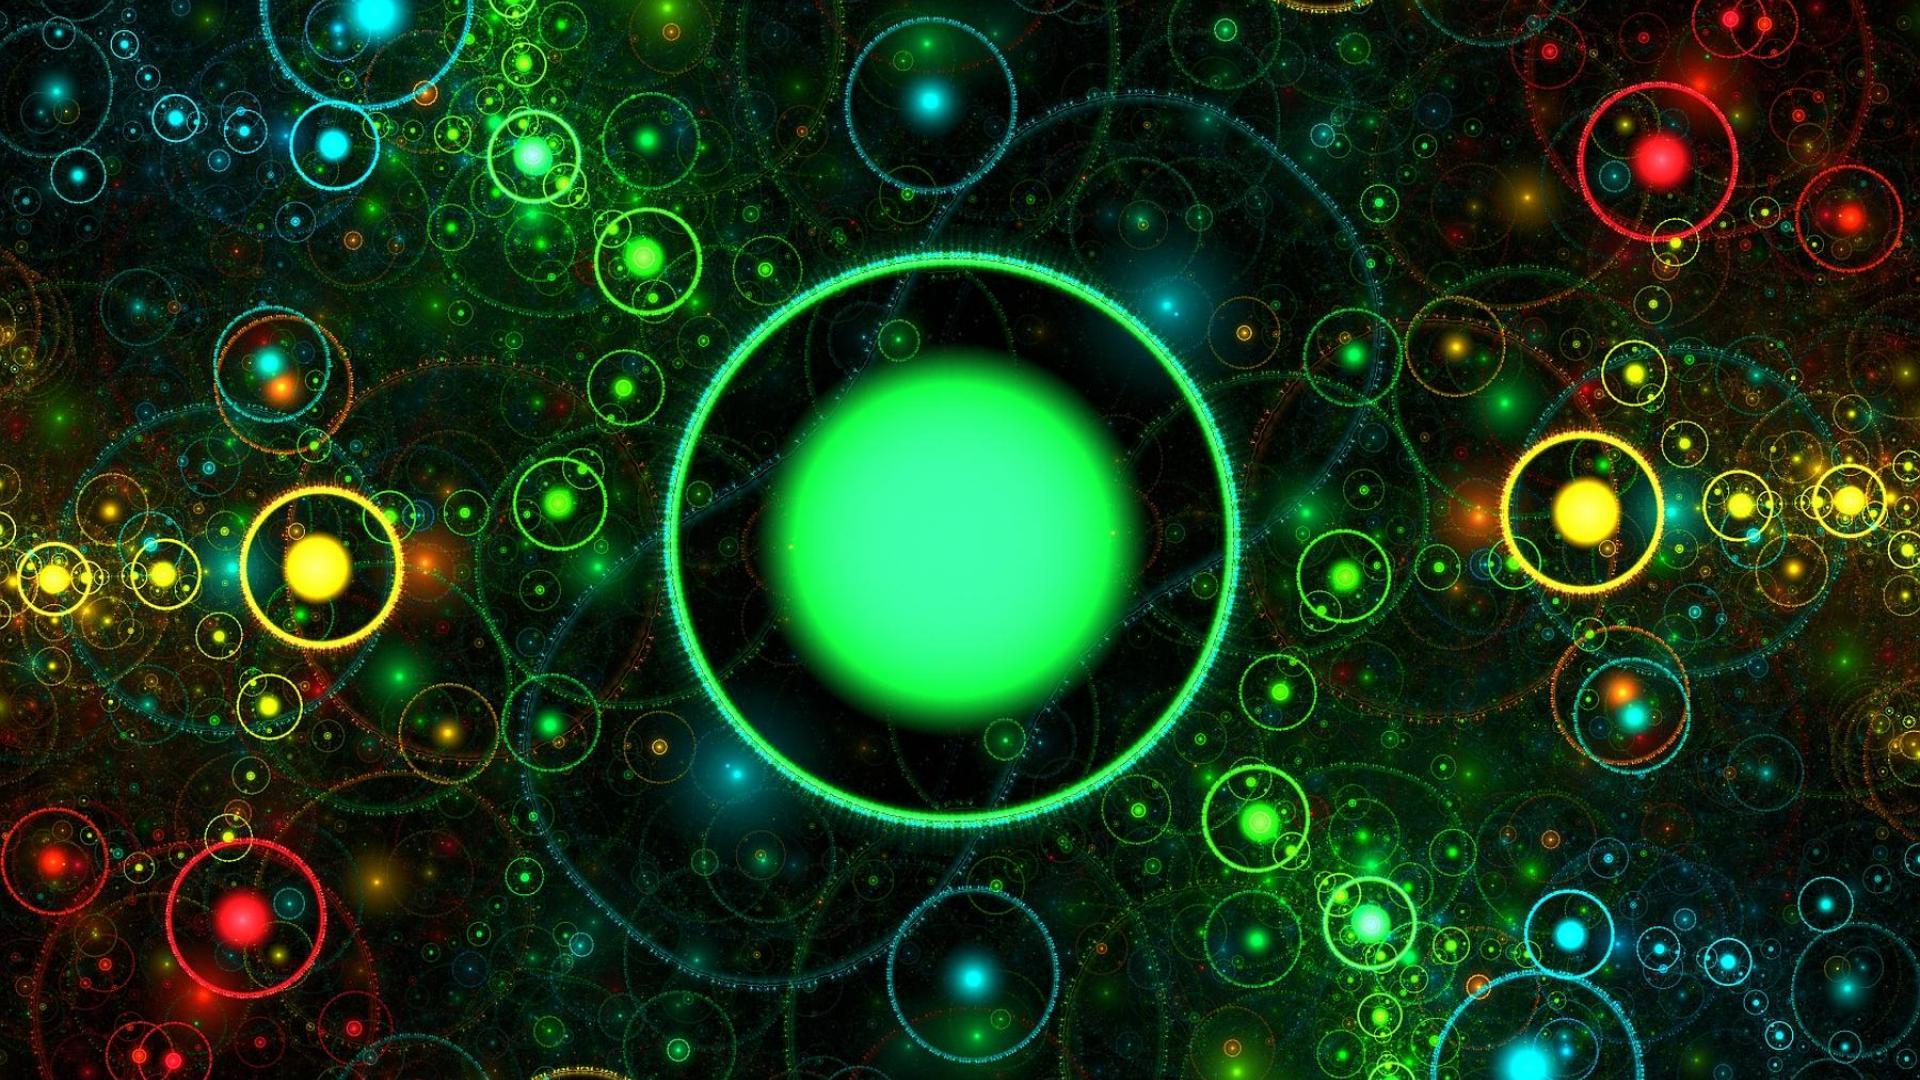 Abstract Space Wallpaper HD | PixelsTalk Net